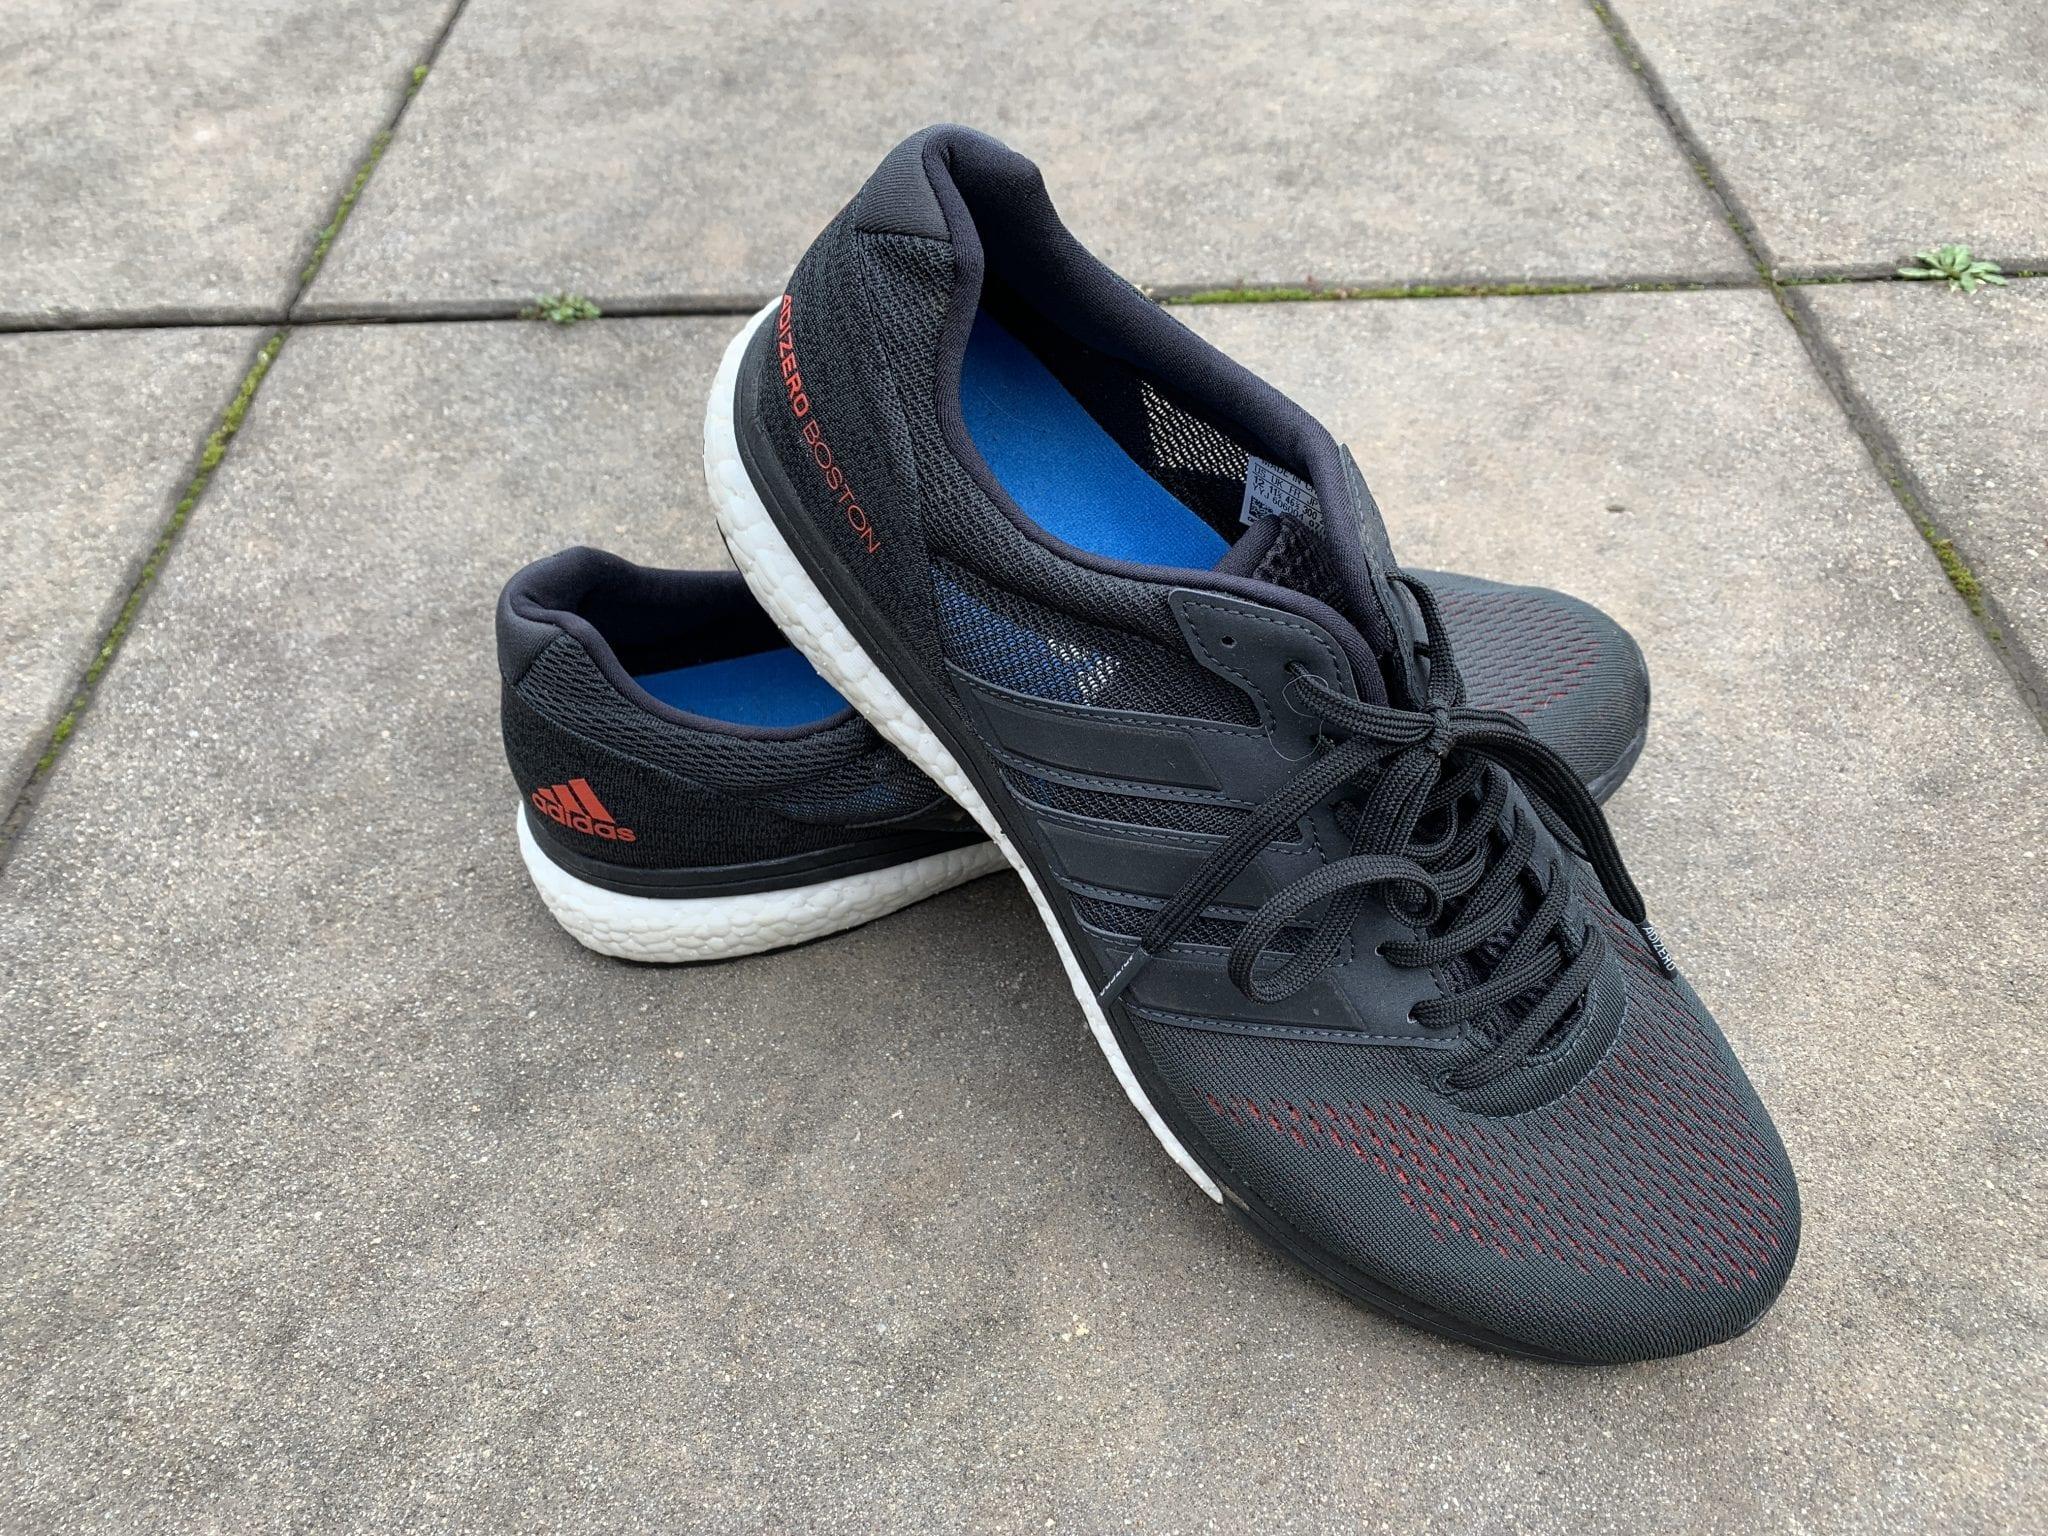 Adidas Adizero Boston7 3